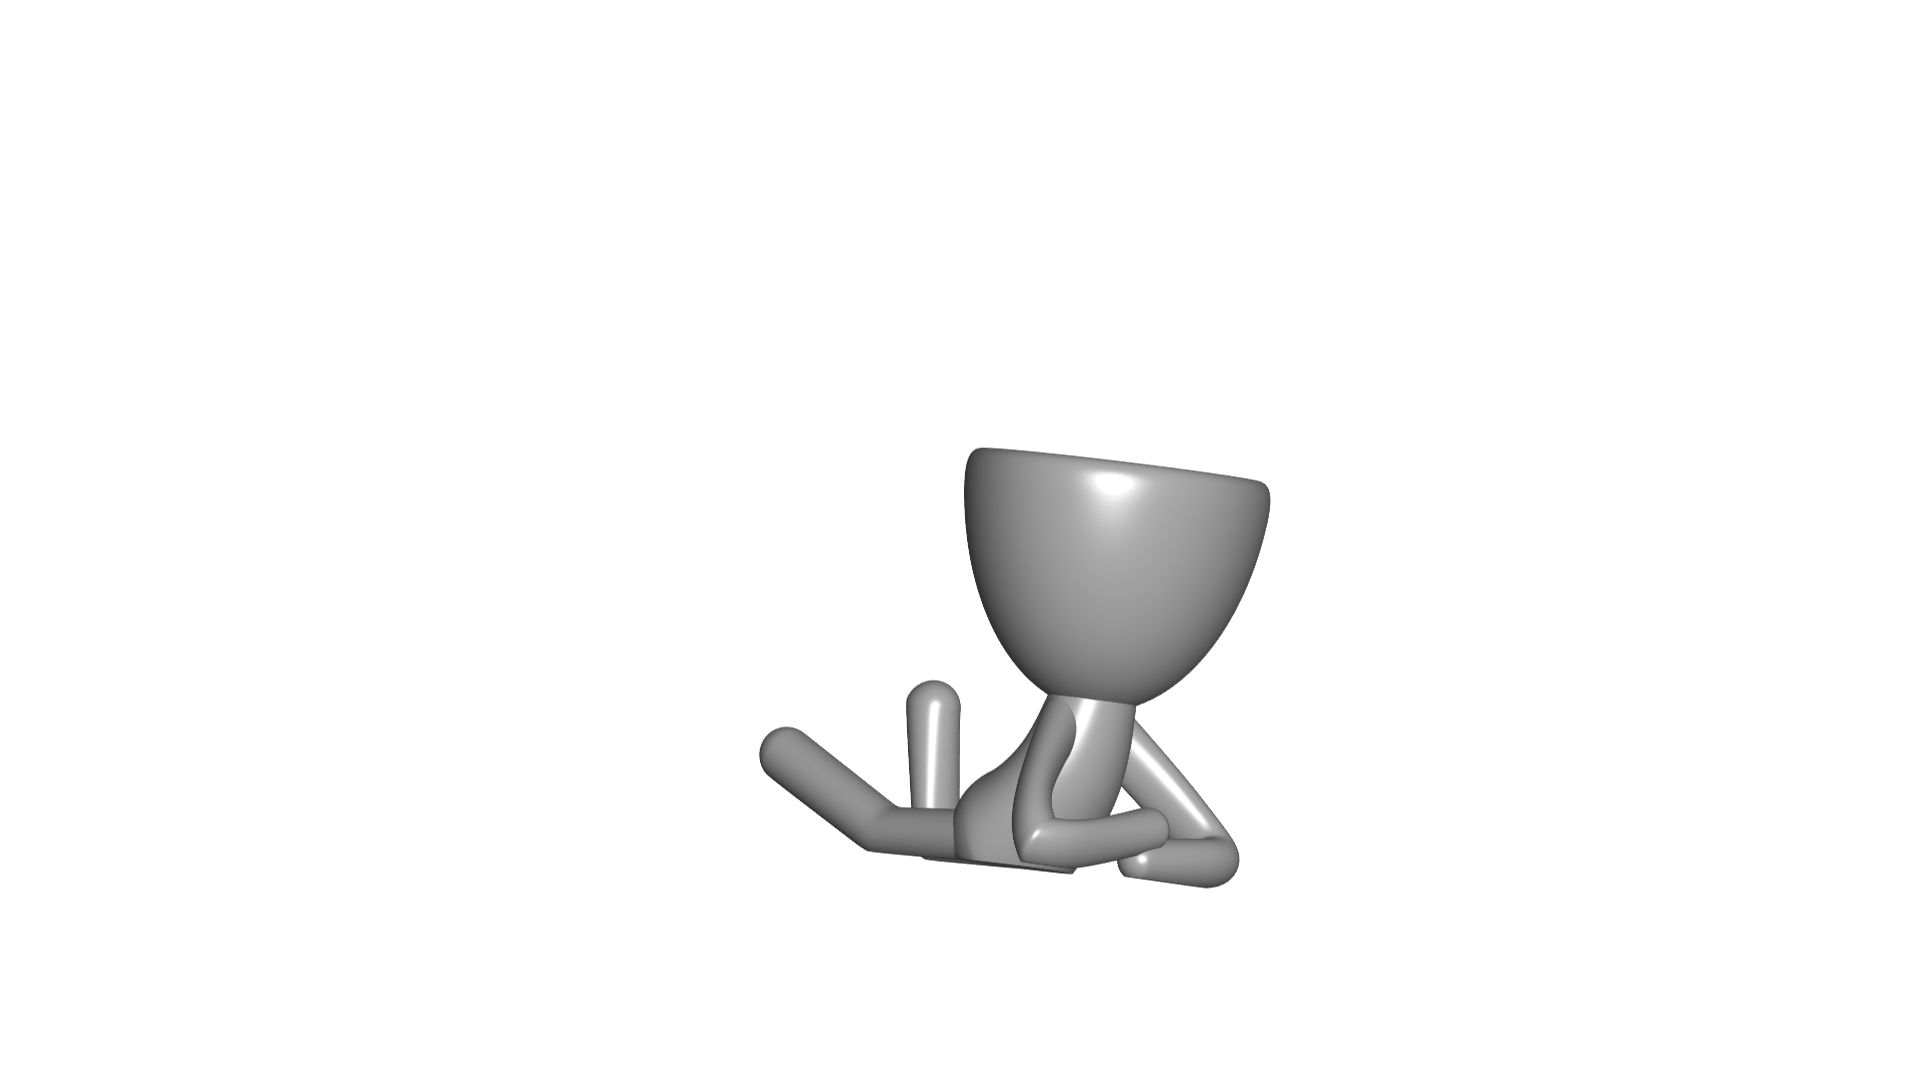 Vaso_02_Gris_1.jpg Download free STL file JARRÓN MACETA ROBERT 02 - VASE FLOWERPOT ROBERT 02 • 3D print model, PRODUSTL56